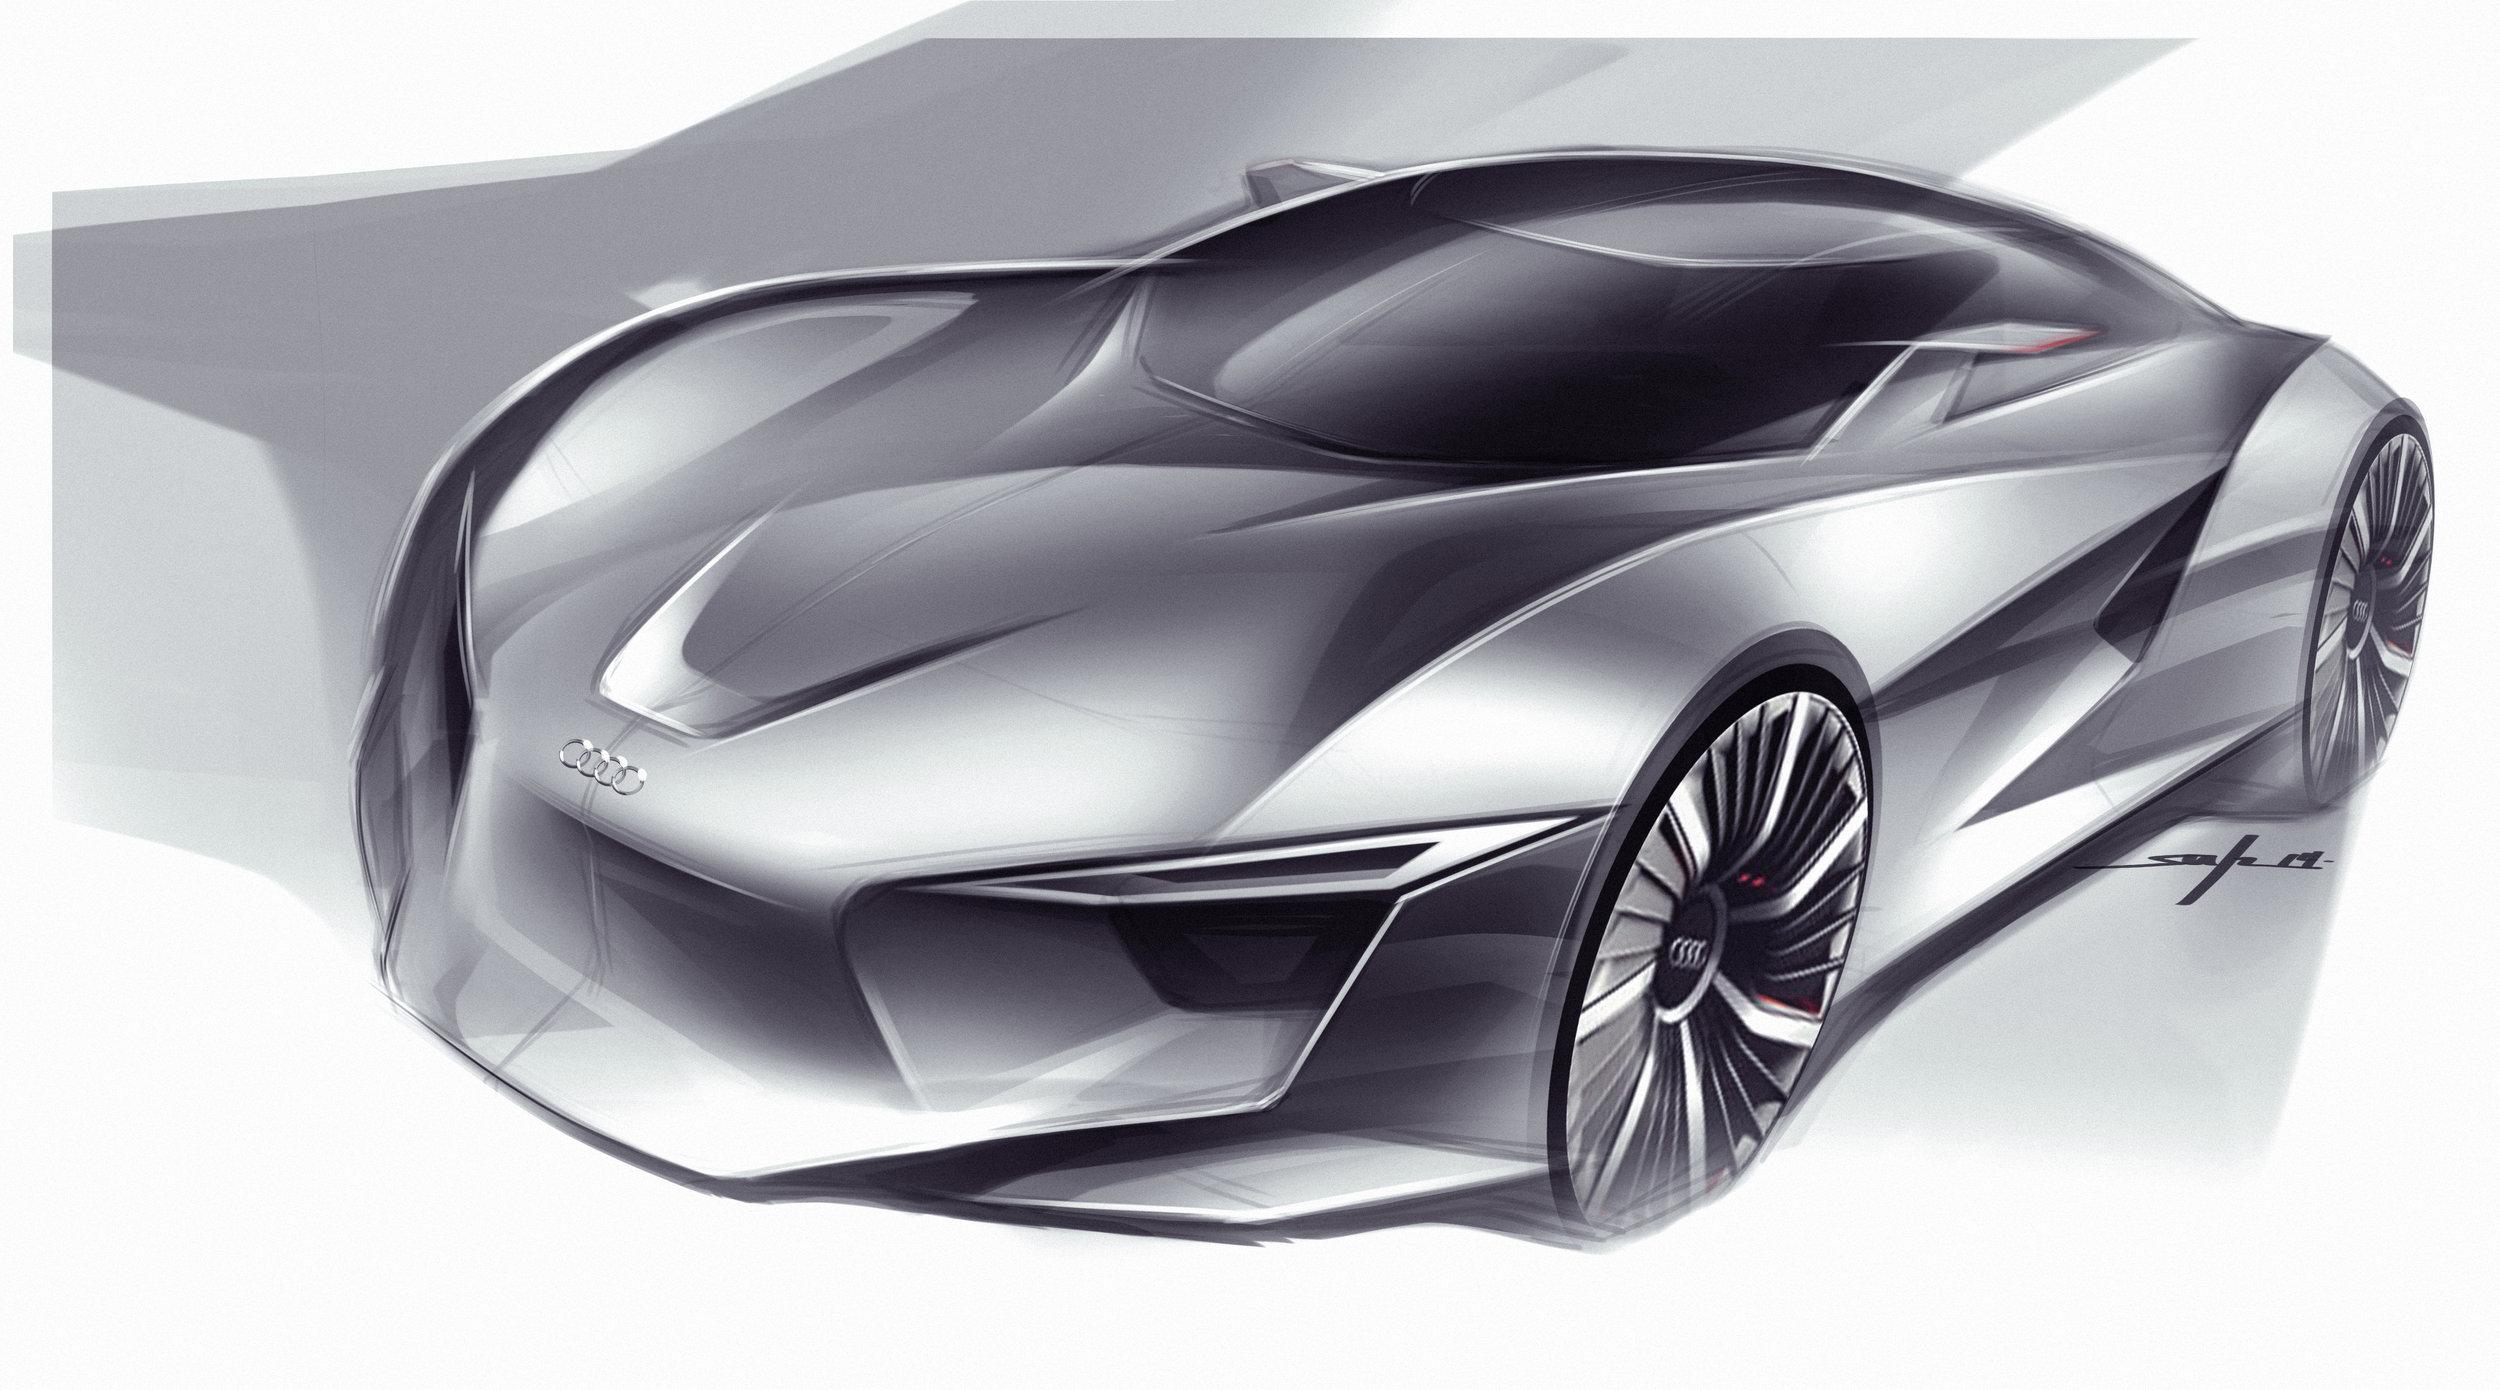 Young-Joon Suh Super Car 2.jpg